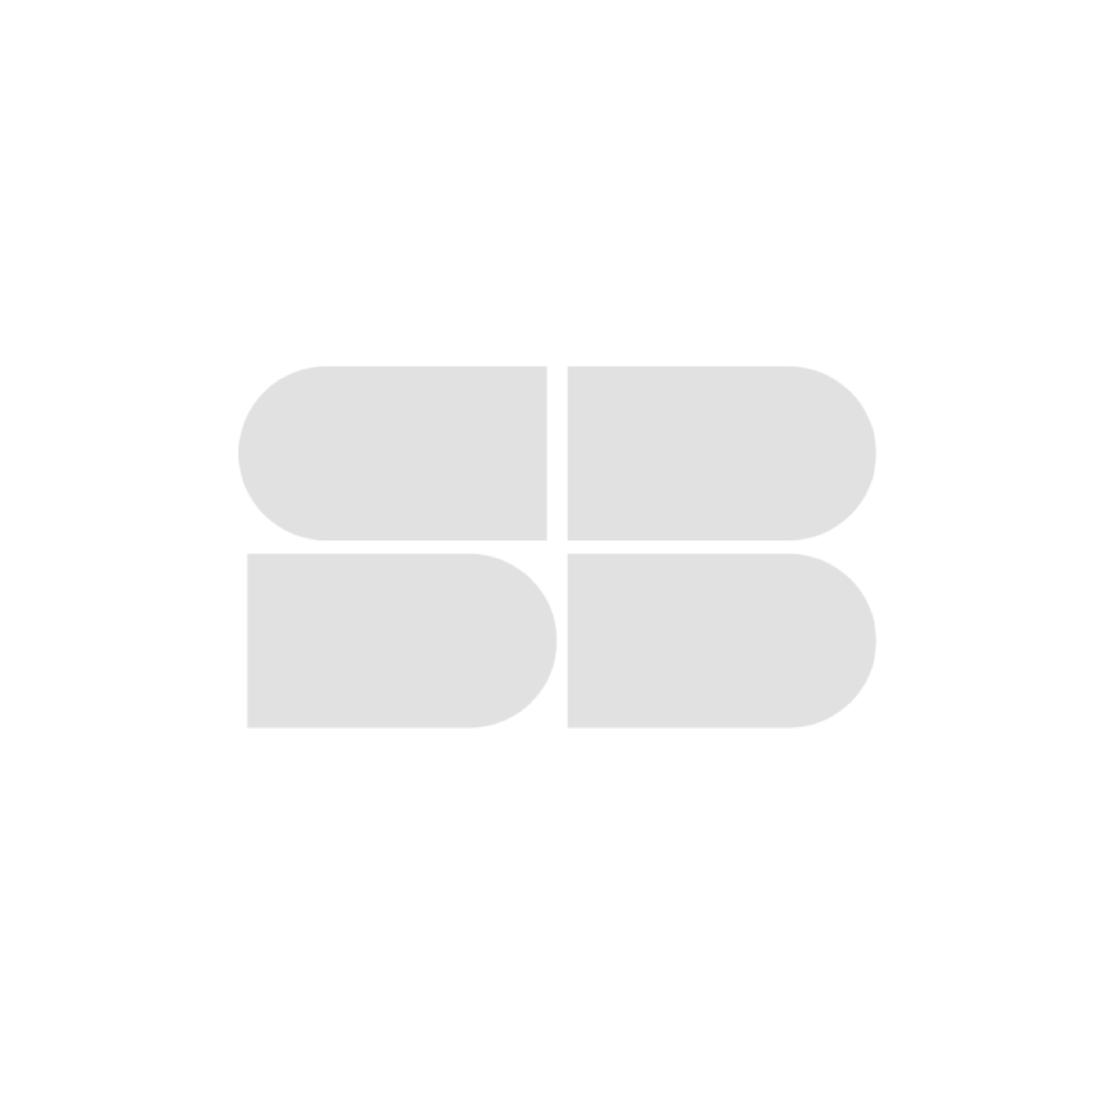 Power Lift Chair ขนาดเล็กกว่า 1.8 ม. รุ่น Uba สีเทา 02